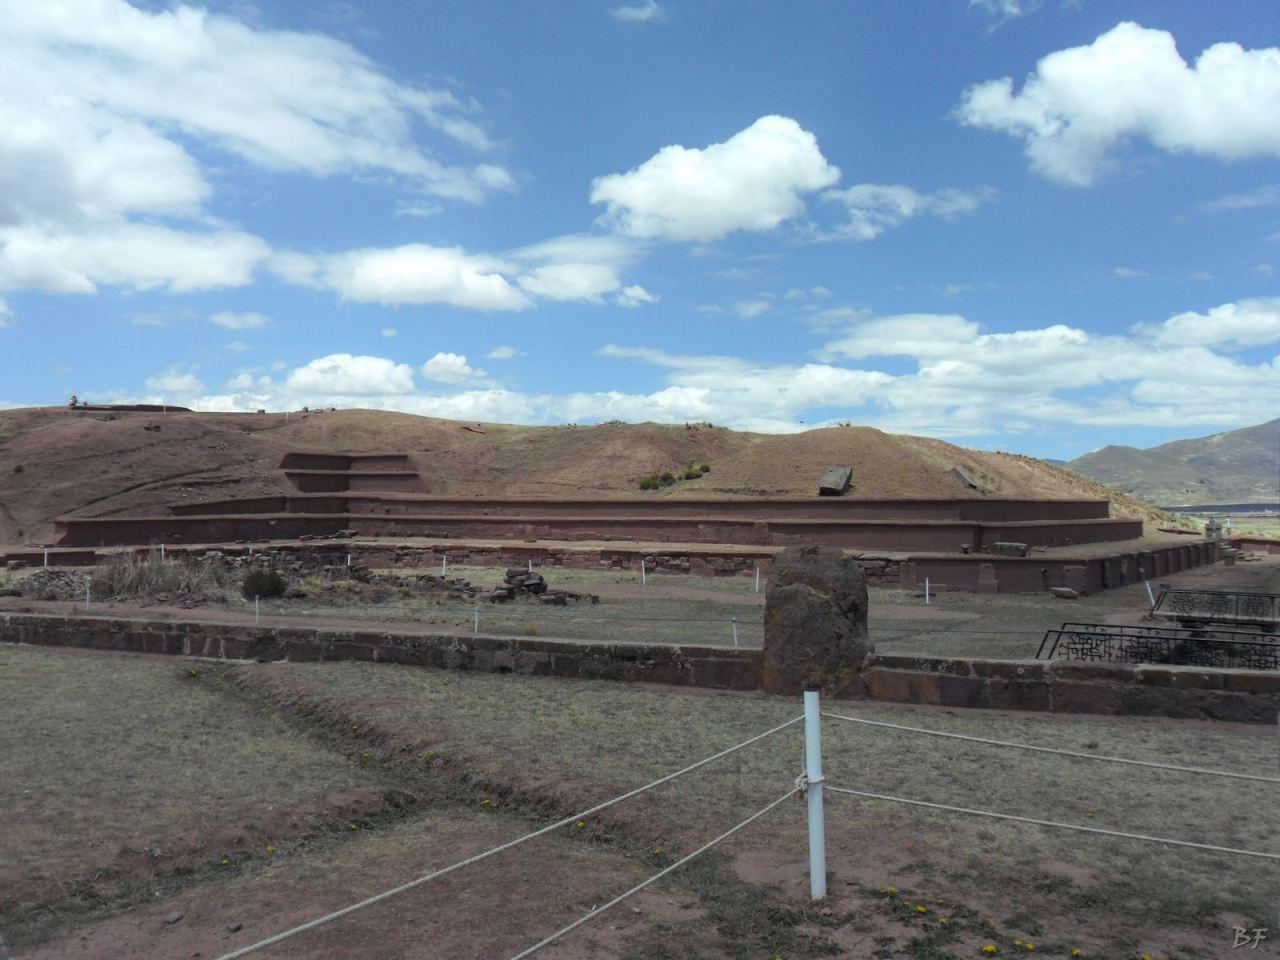 Sito-Megalitico-Piramide-Akapana-Kalasasaya-Menhir-Tiahuanaco-Bolivia-57